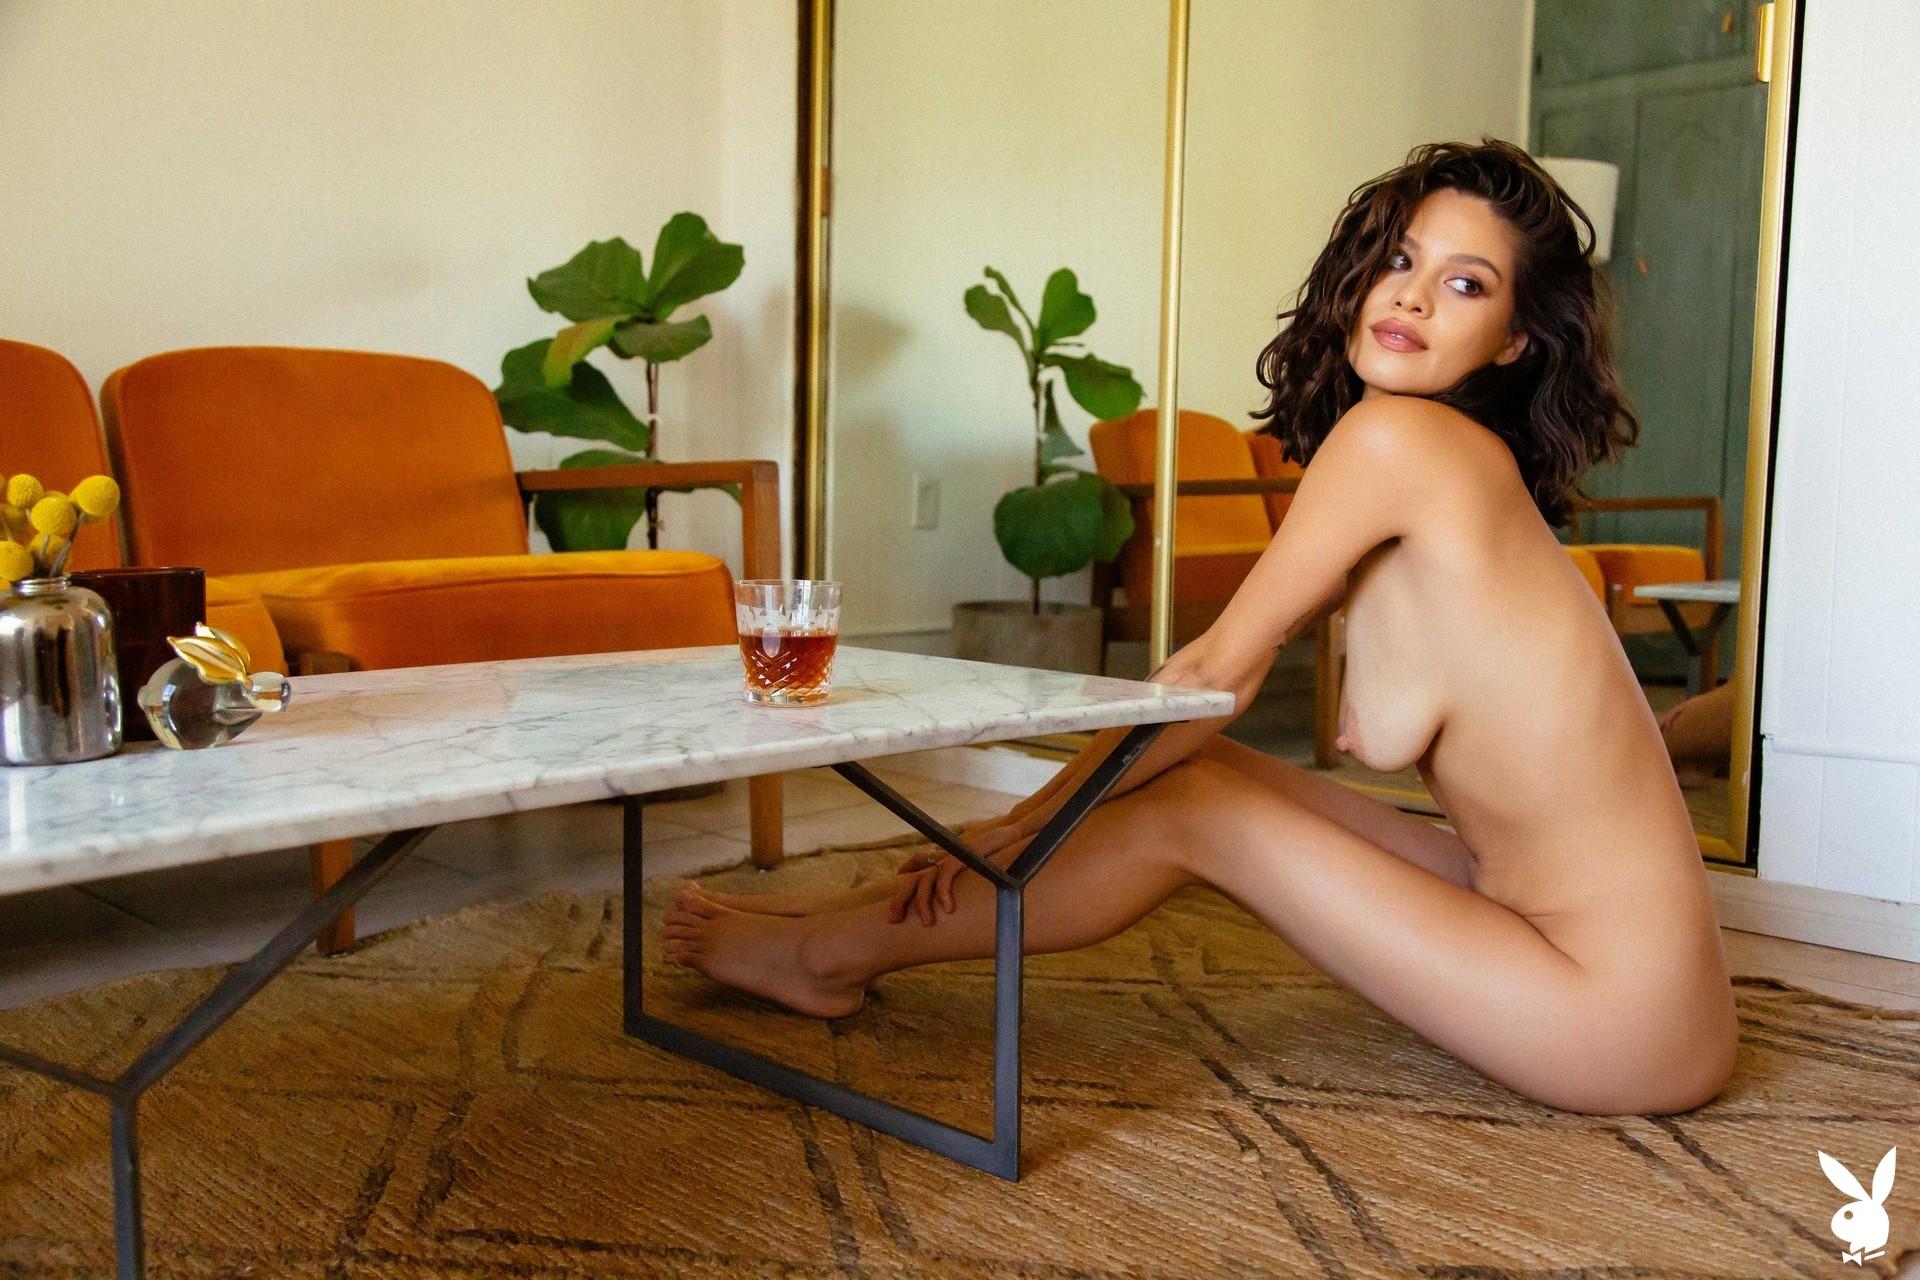 Natalie Del Real In The Simple Things Playboy Plus (36)